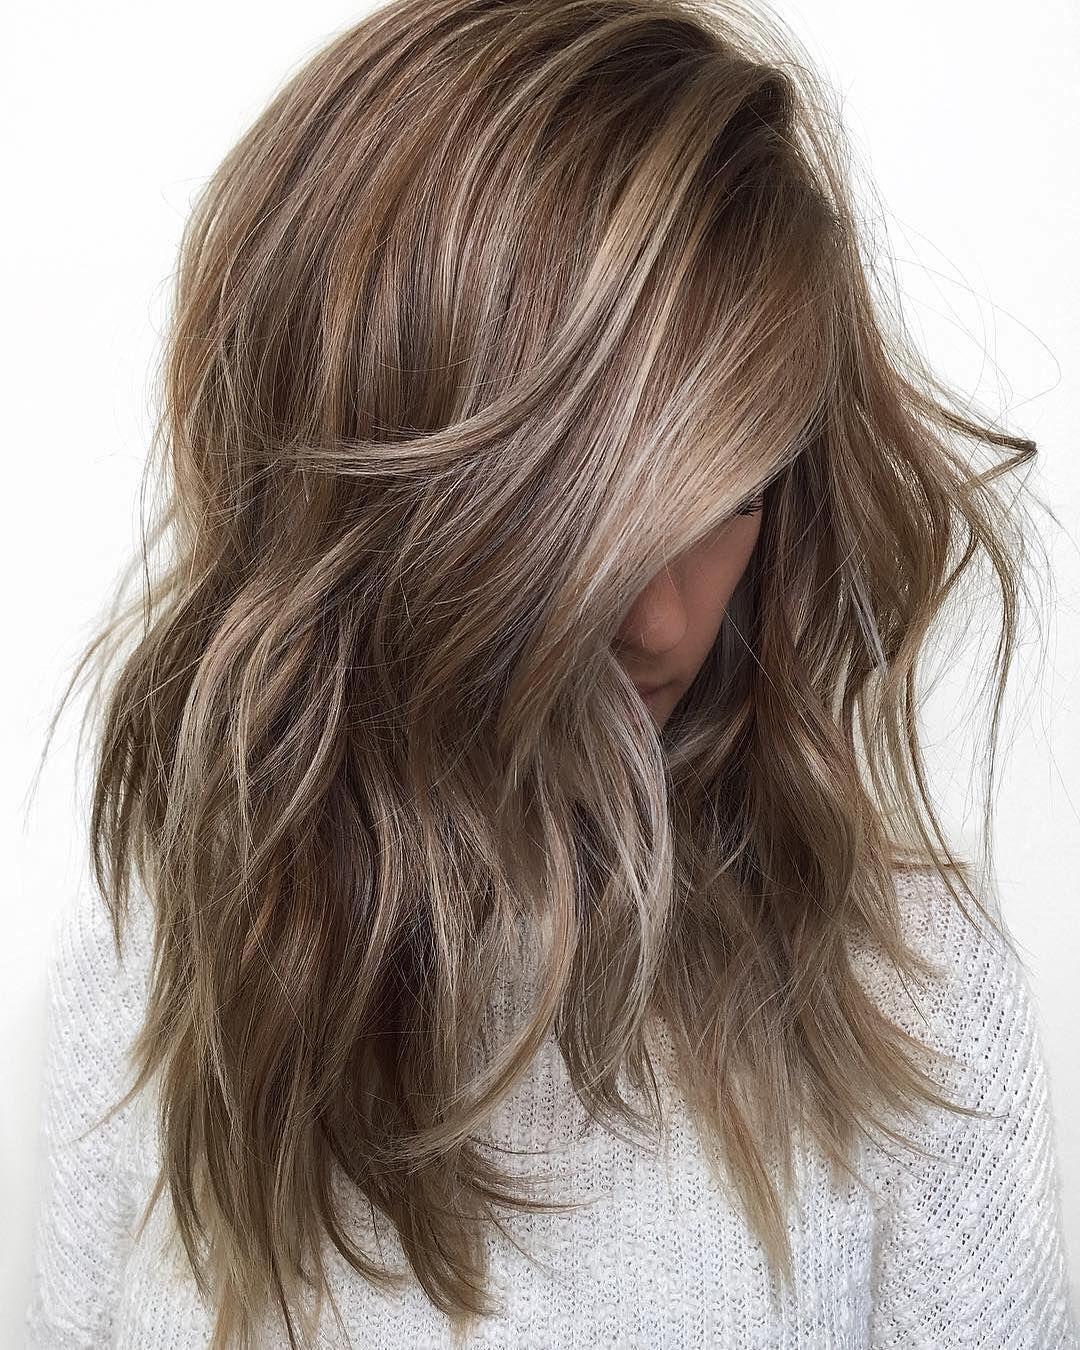 Trendy Hair Color Designs for Medium Length Hair, Medium Hairstyle